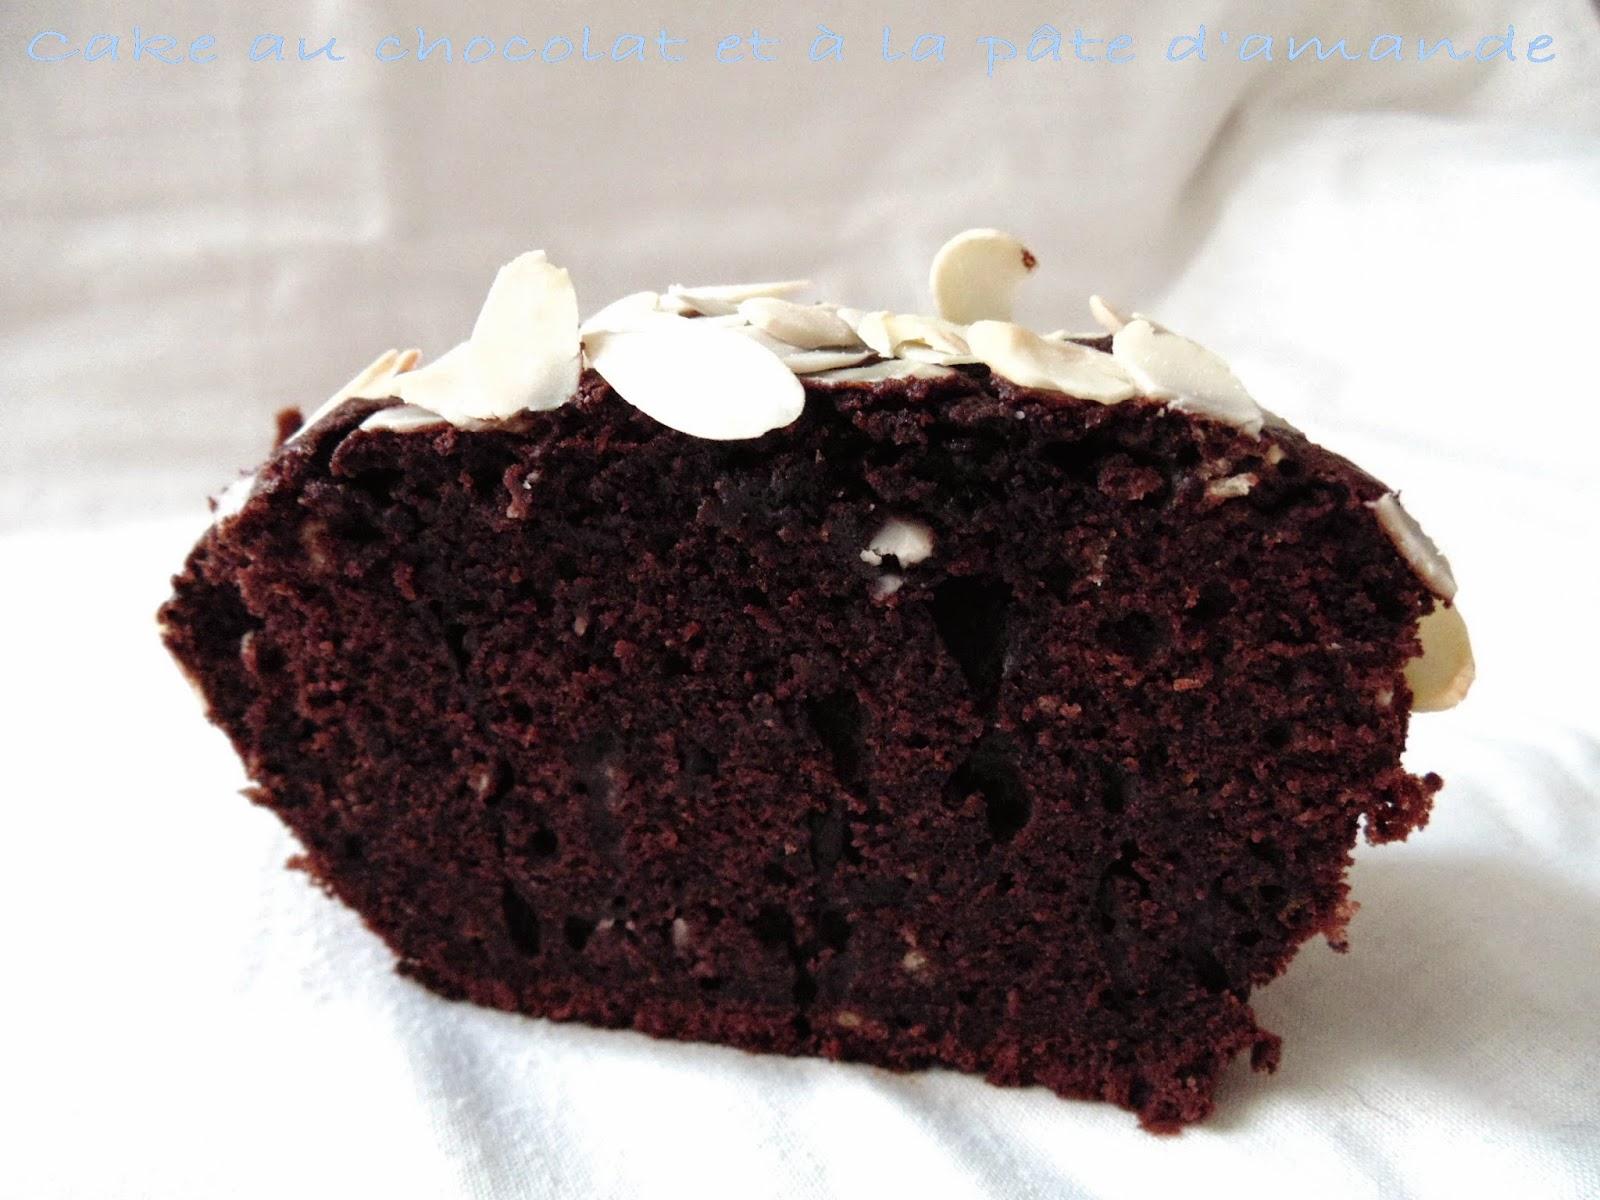 gateau gaga love cakes cake au chocolat et la p te d 39 amande. Black Bedroom Furniture Sets. Home Design Ideas